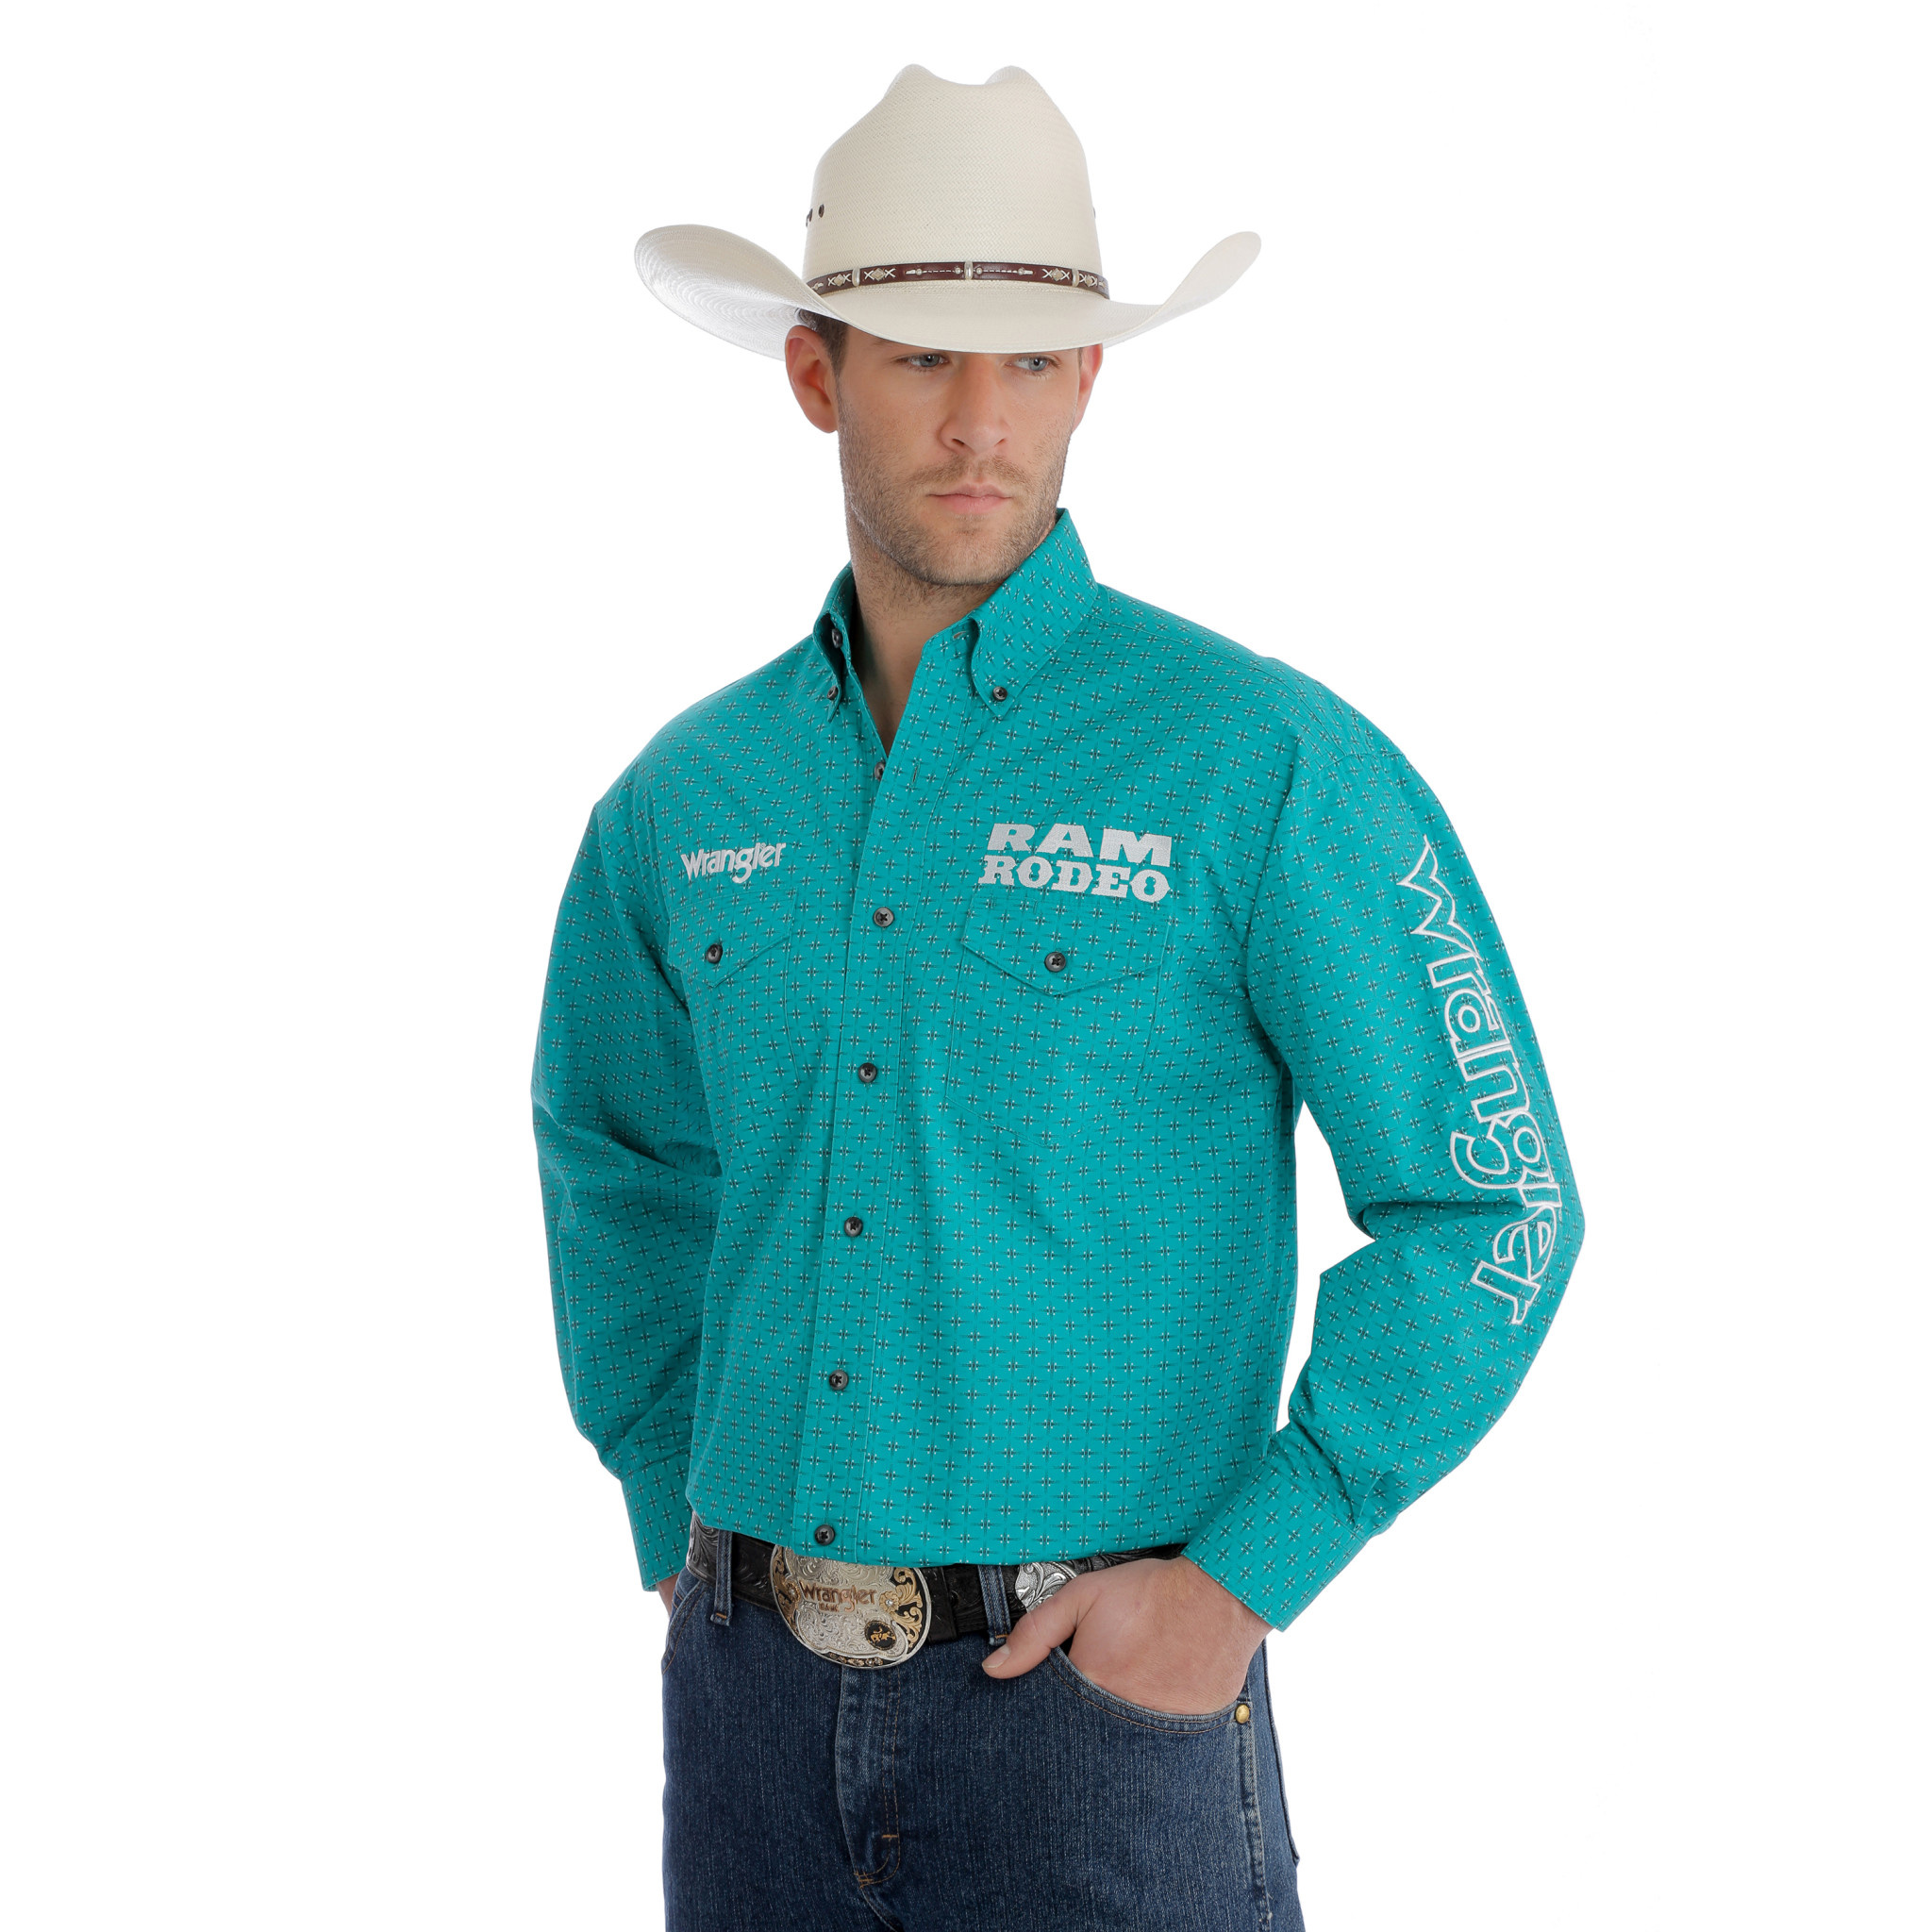 331810b1 Wrangler Shirt Printed Snap Western Ram Rodeo Series Logo MP2345M. prev